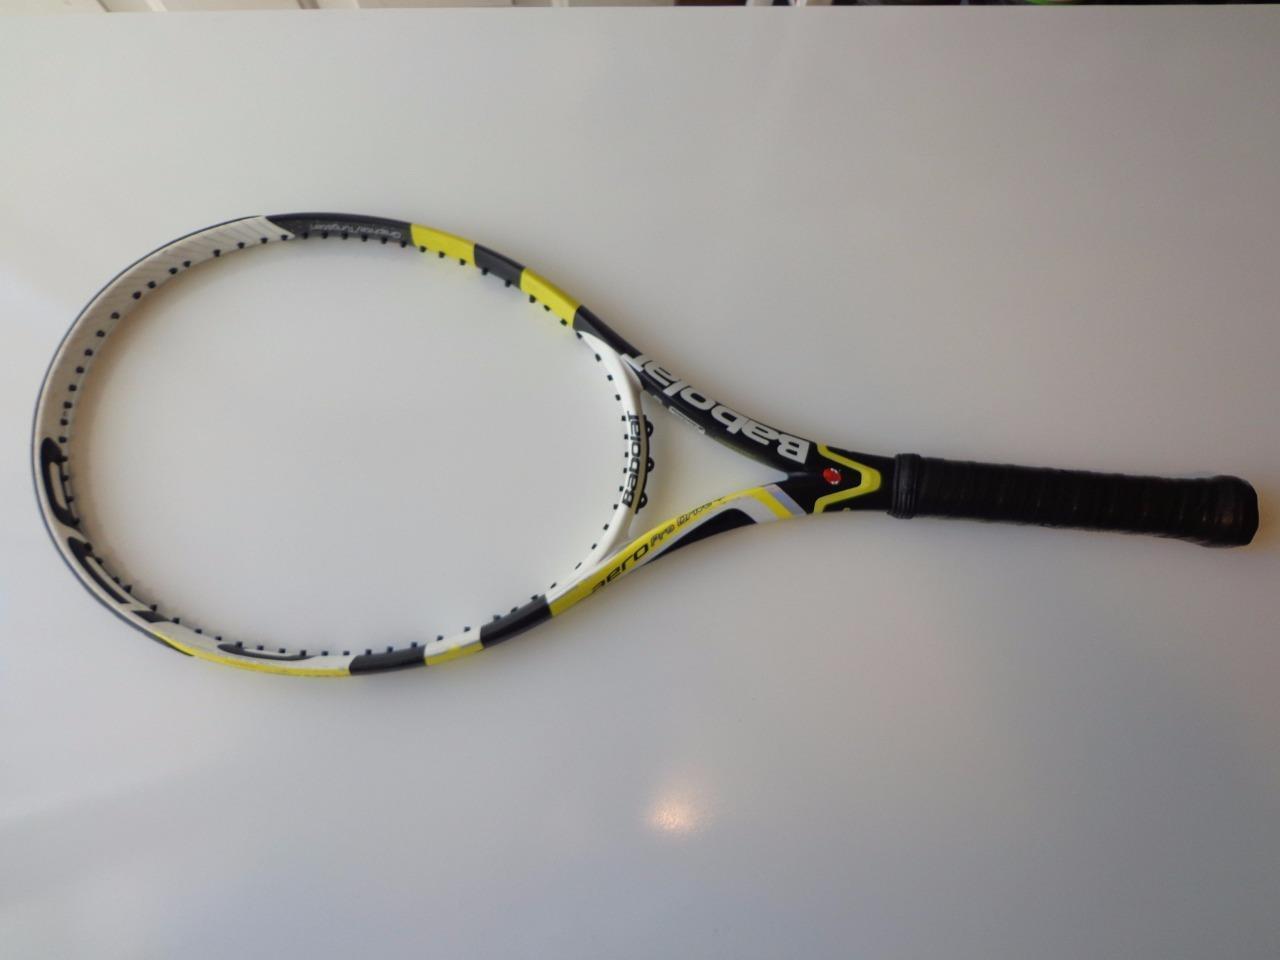 Babolat Babolat Babolat Aero Drive PLUS GT 27.5 inches 10.6oz 4 1/4 grip Tennis Racquet 9c273b